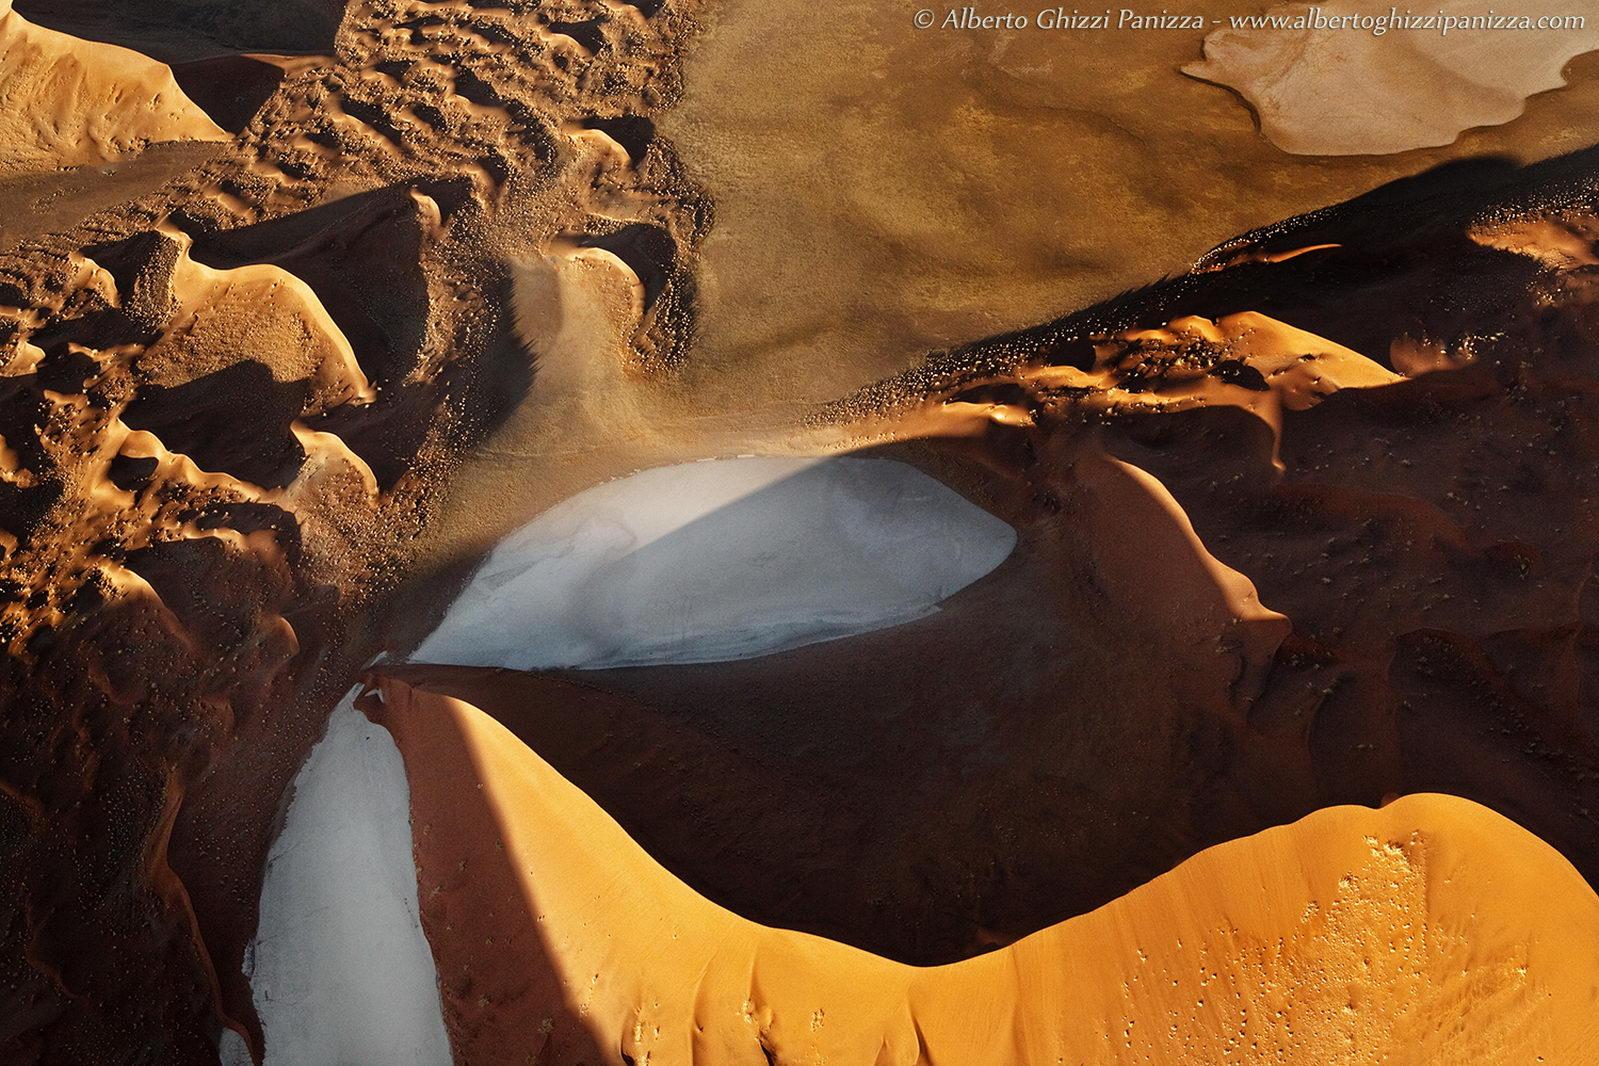 Namibia ‹ Alberto Ghizzi Panizza – Photographer